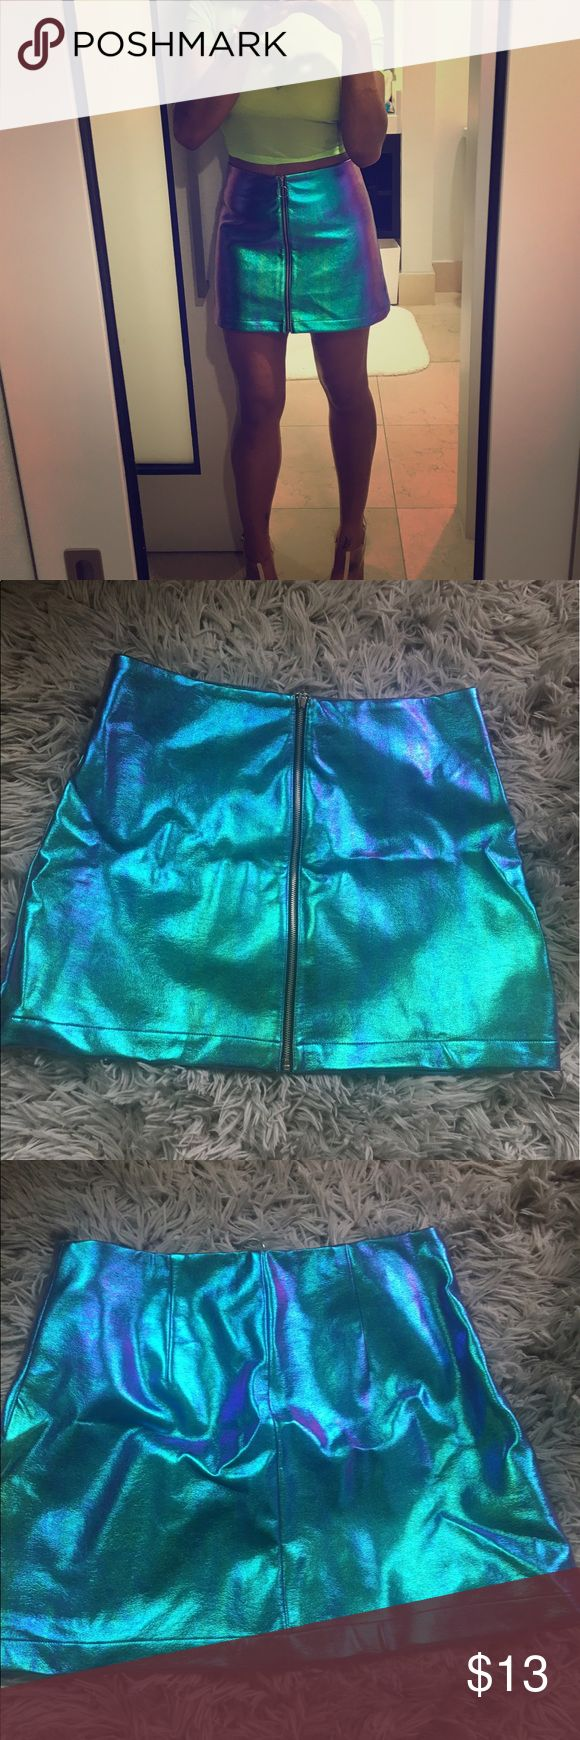 Forever 21 Metallic Zip up skirt Purple/blue Metallic zip up skirt Forever 21 Skirts Mini